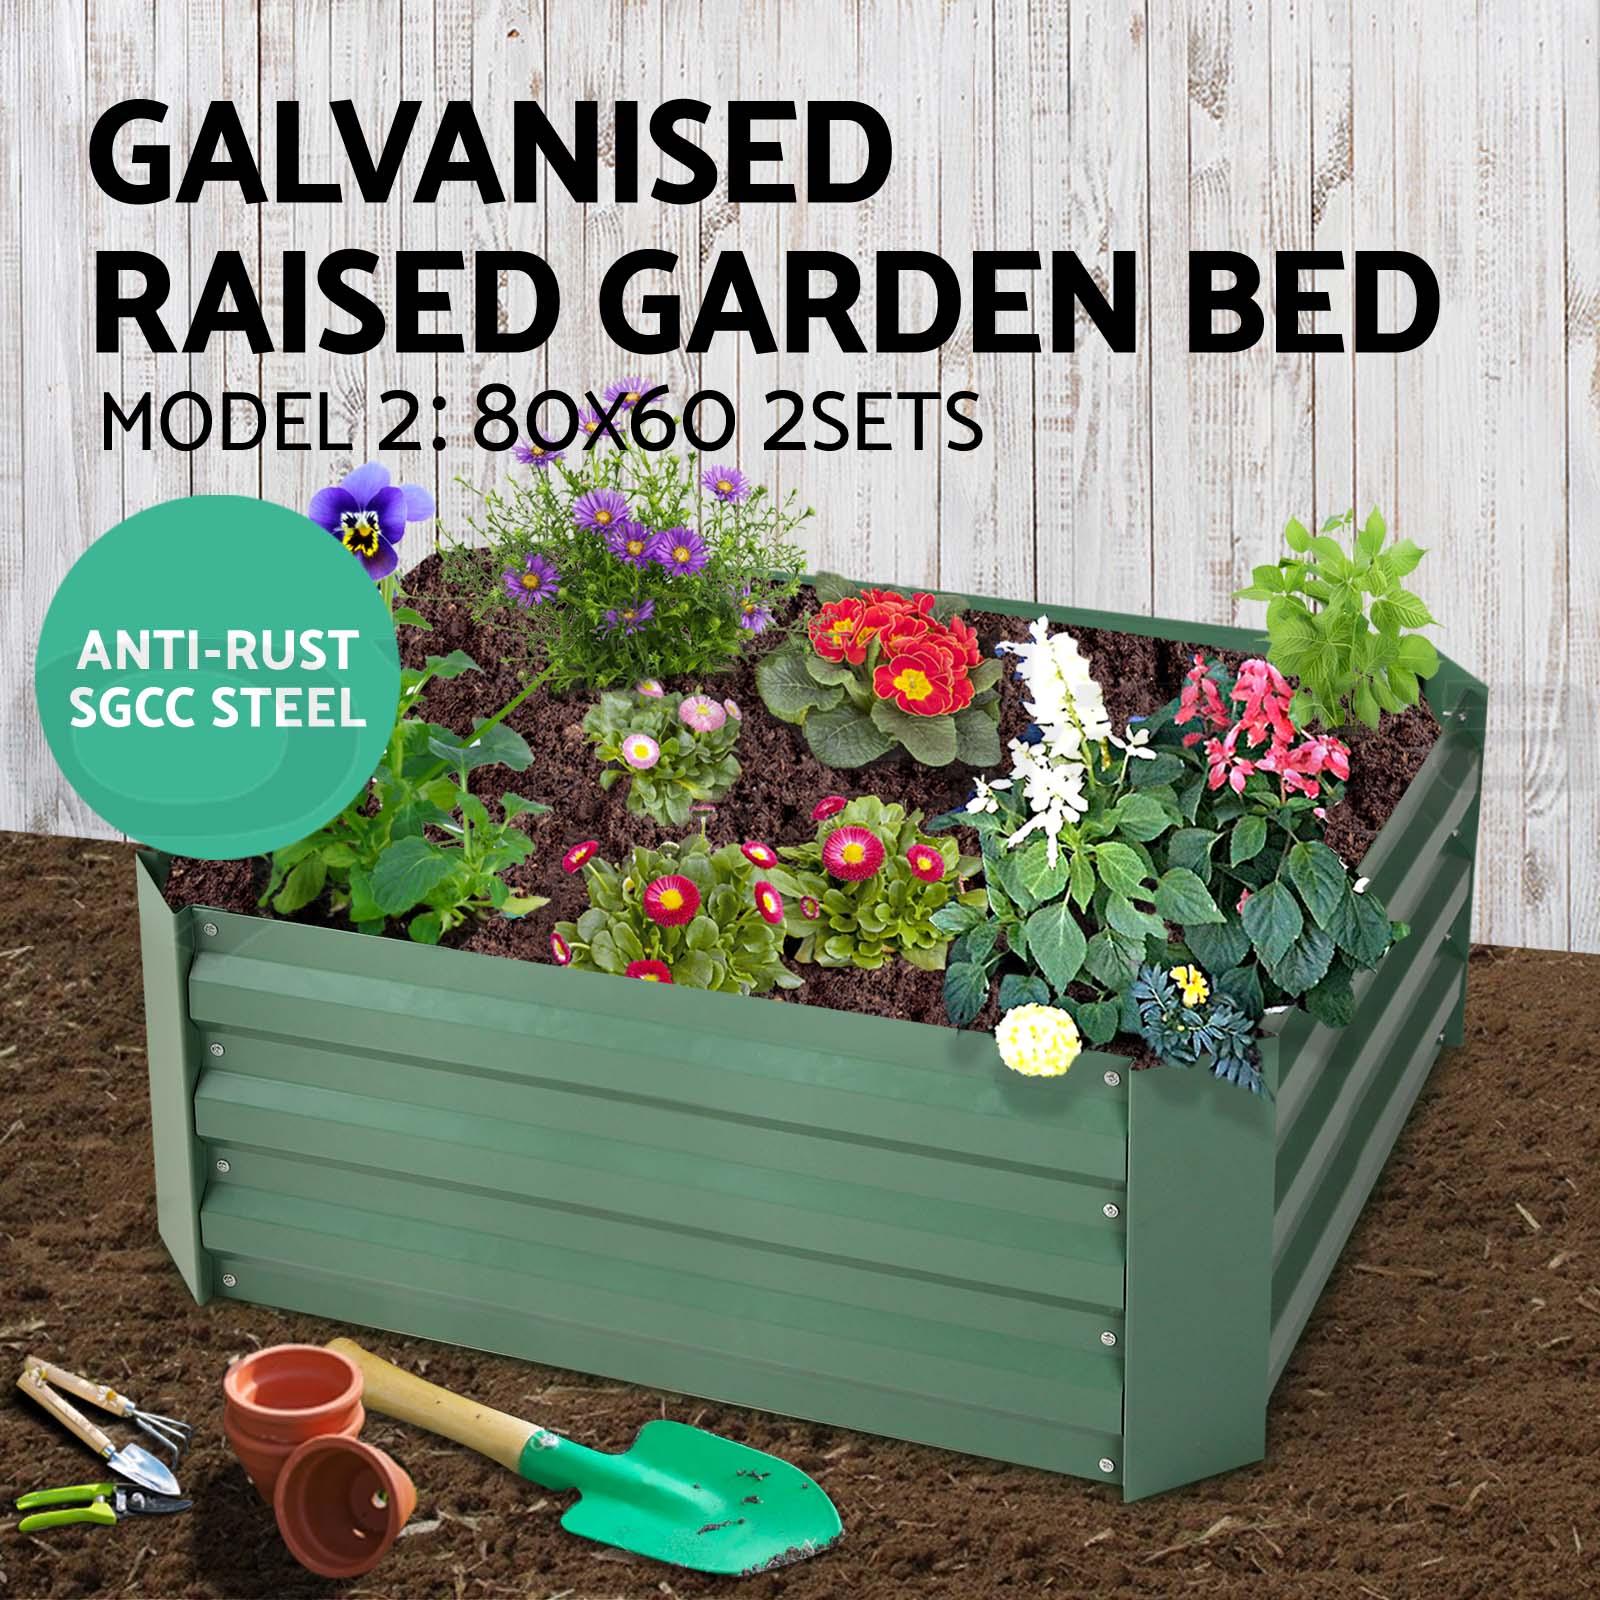 Galvanised Steel Raised Garden Bed Instant Planter Square